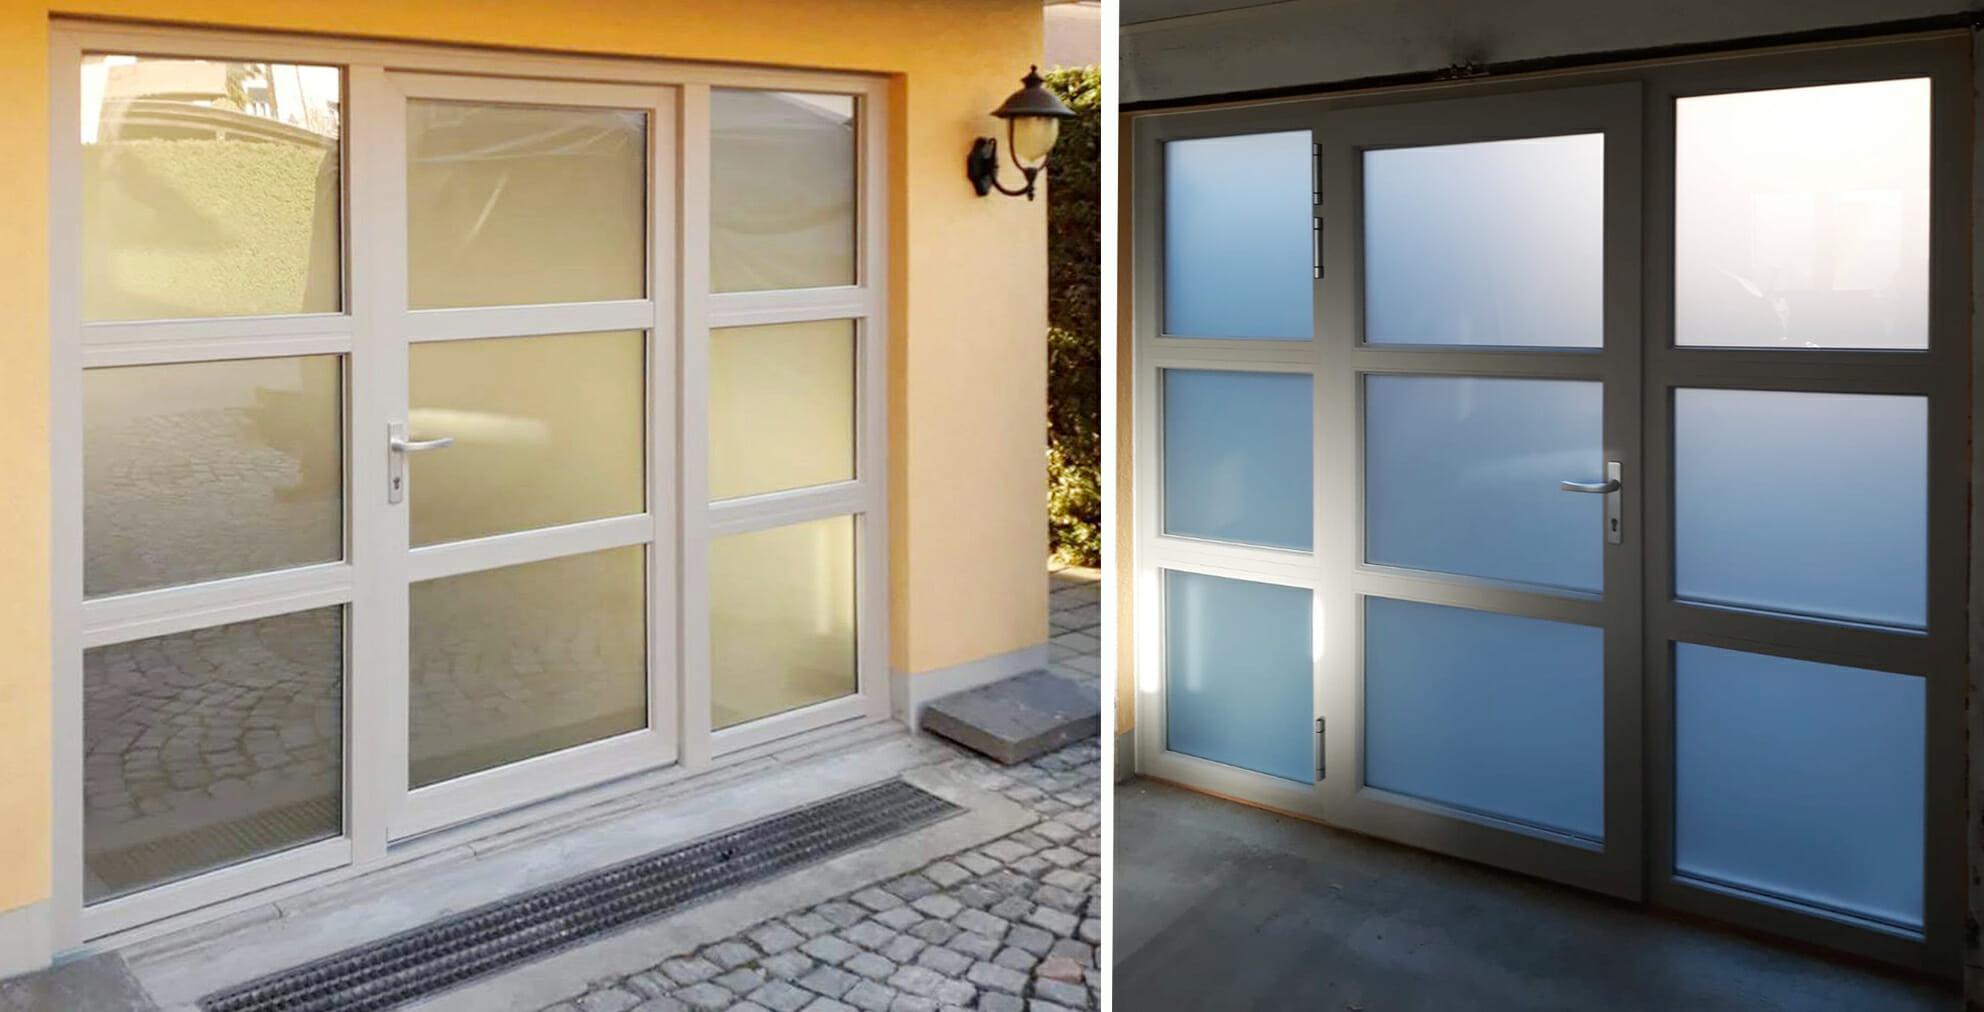 Portoncino-Finstral-in-PVC-e-PVC-vetrati